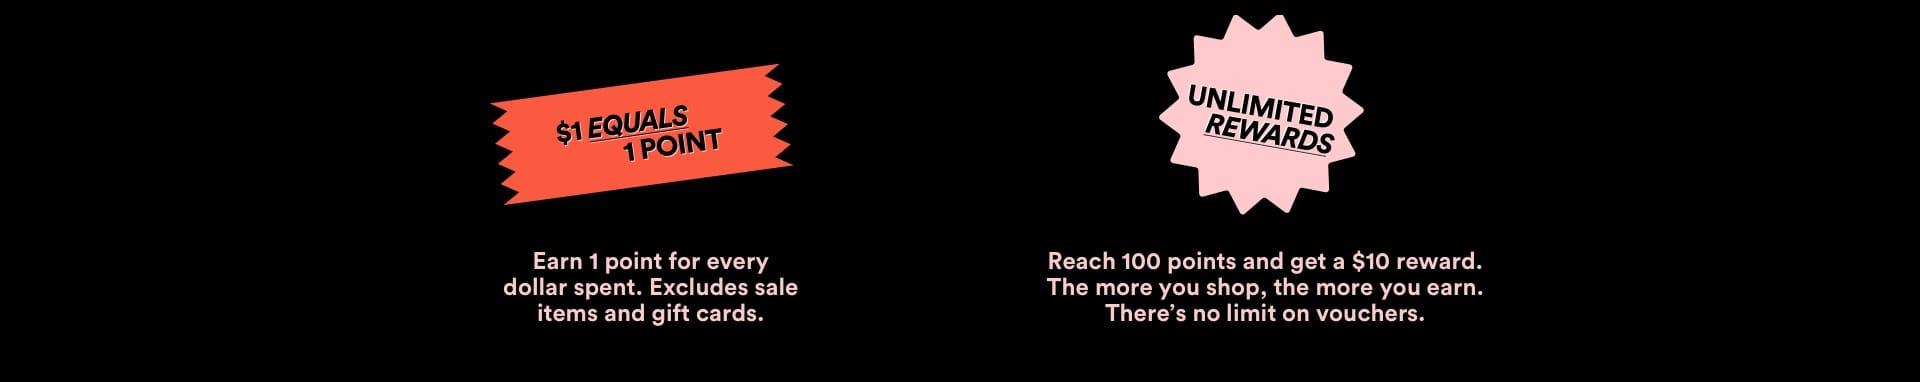 $1 Equals 1 Point. Unlimited Rewards: Reach 100 points and get a $10 reward.